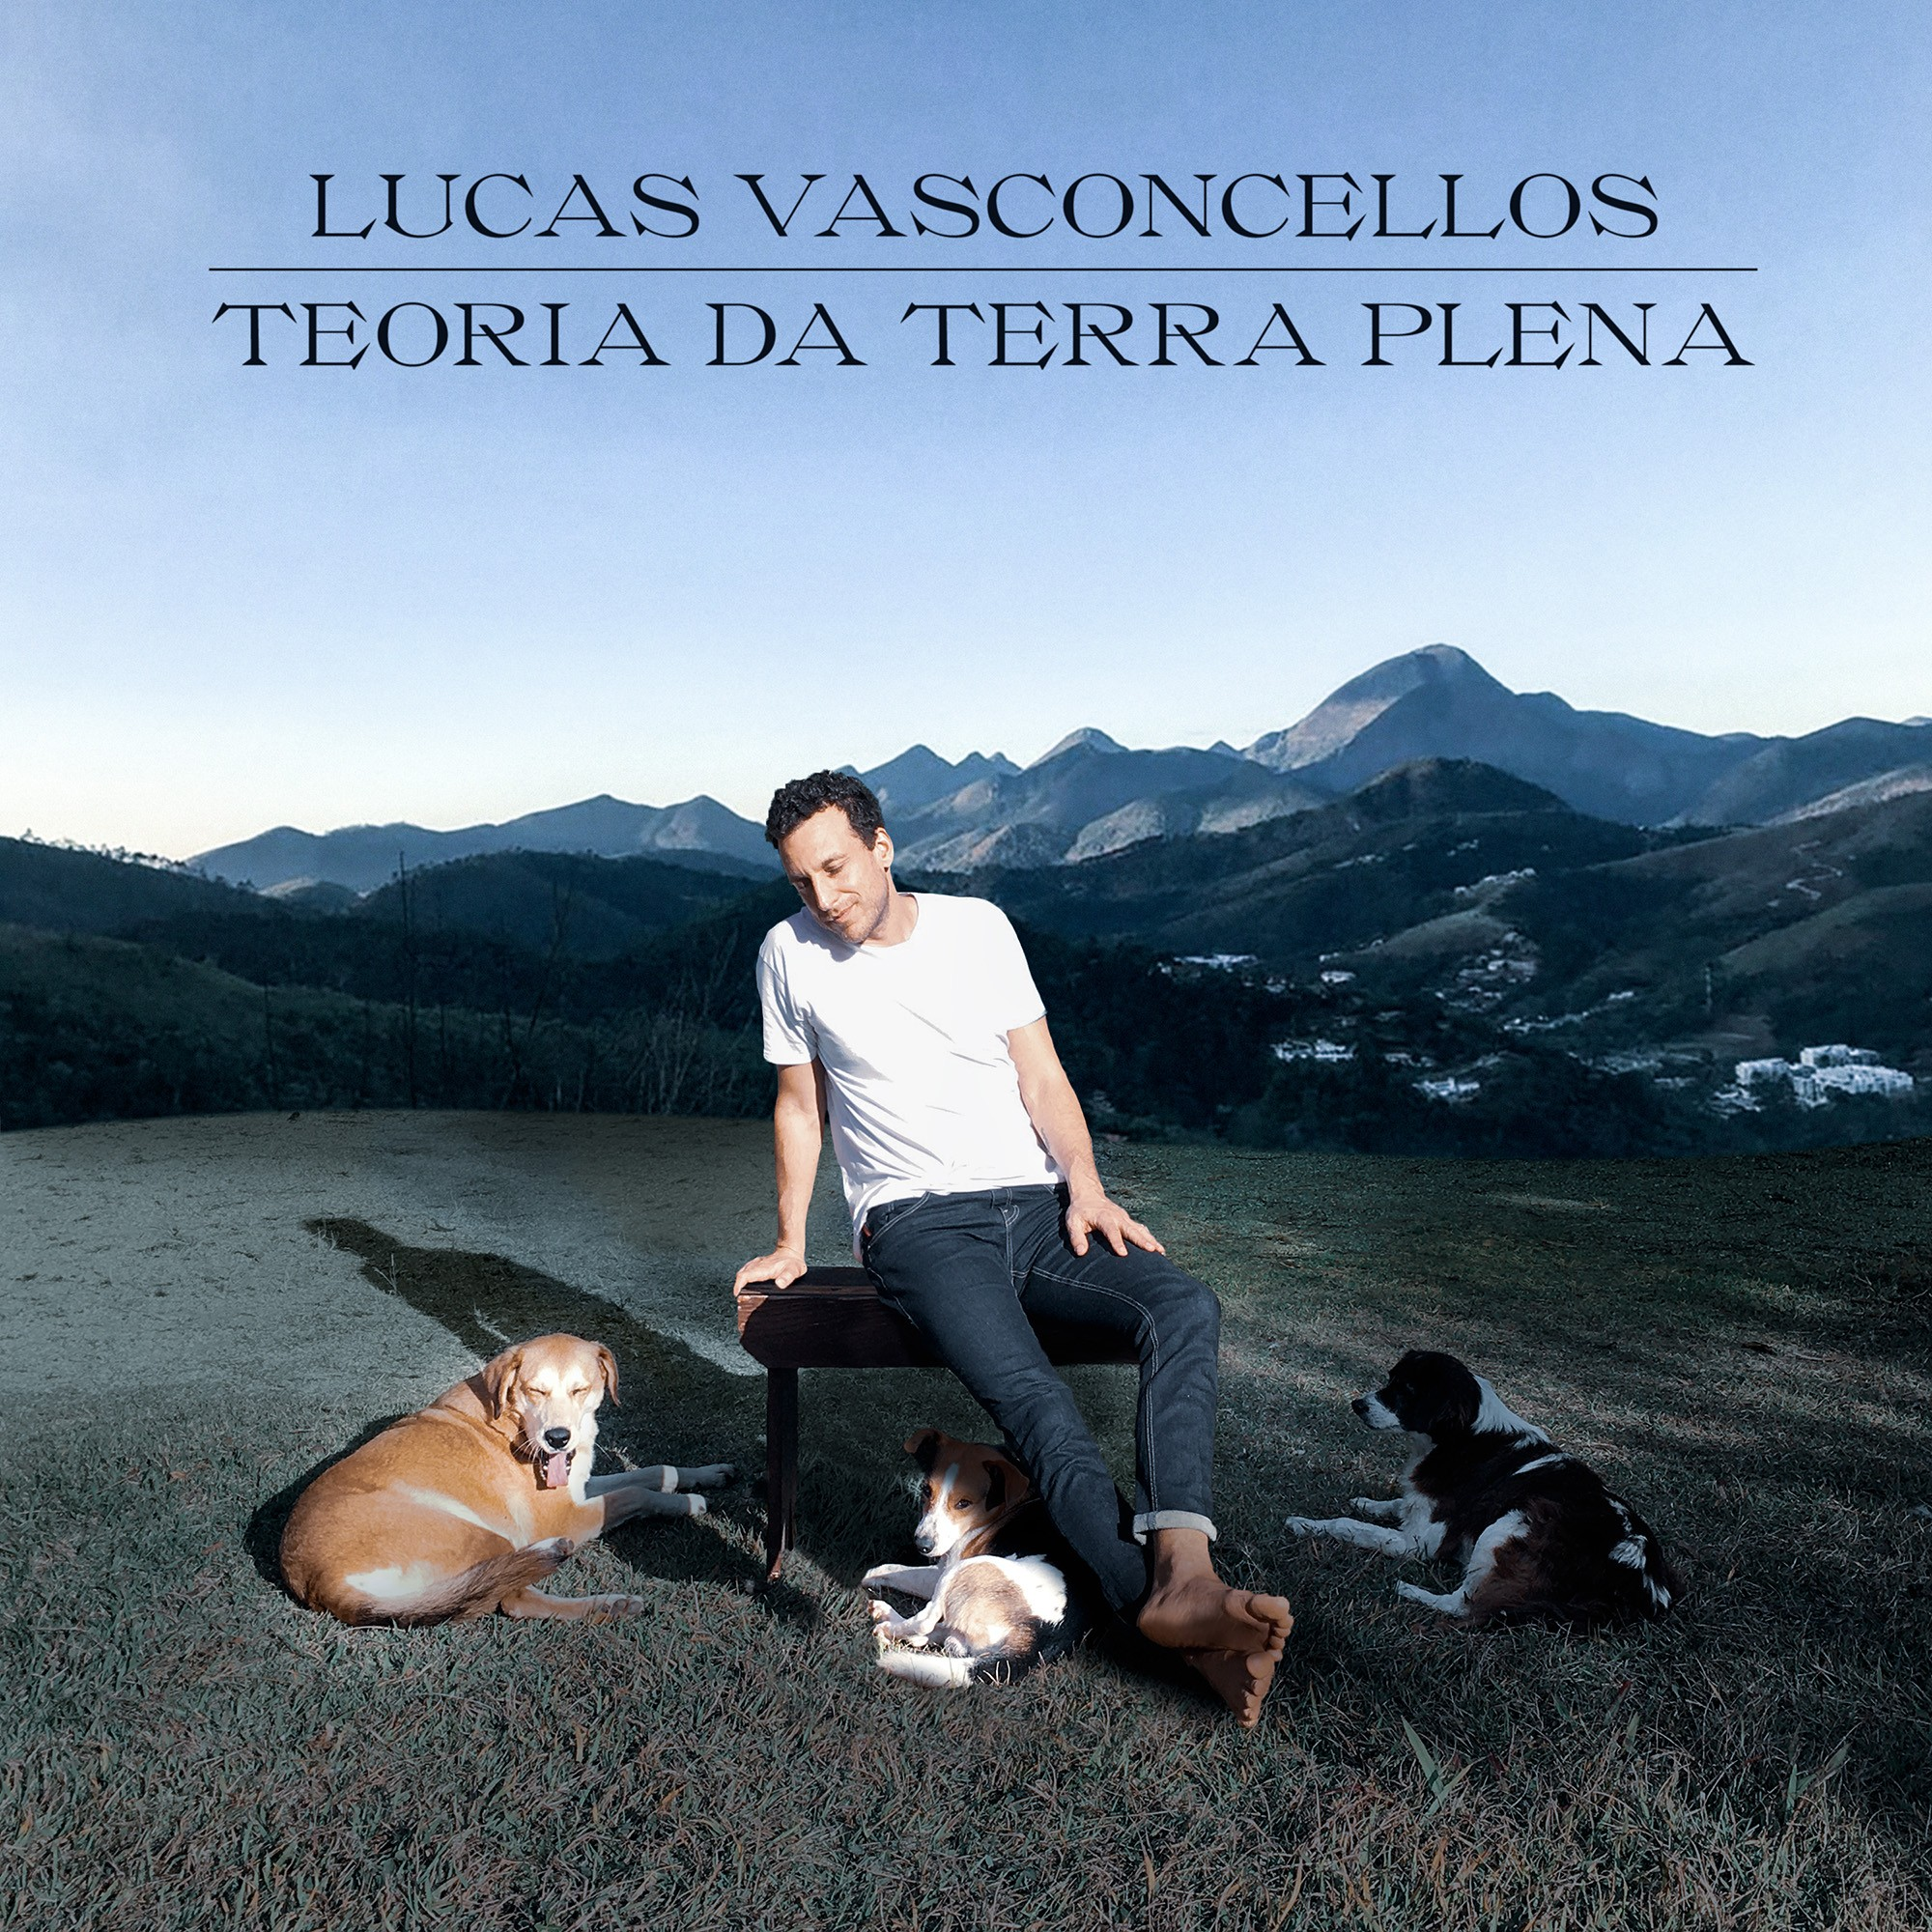 Lucas Vasconcellos celebra disco icônico de George Harrison na capa do álbum 'Teoria da terra plena'